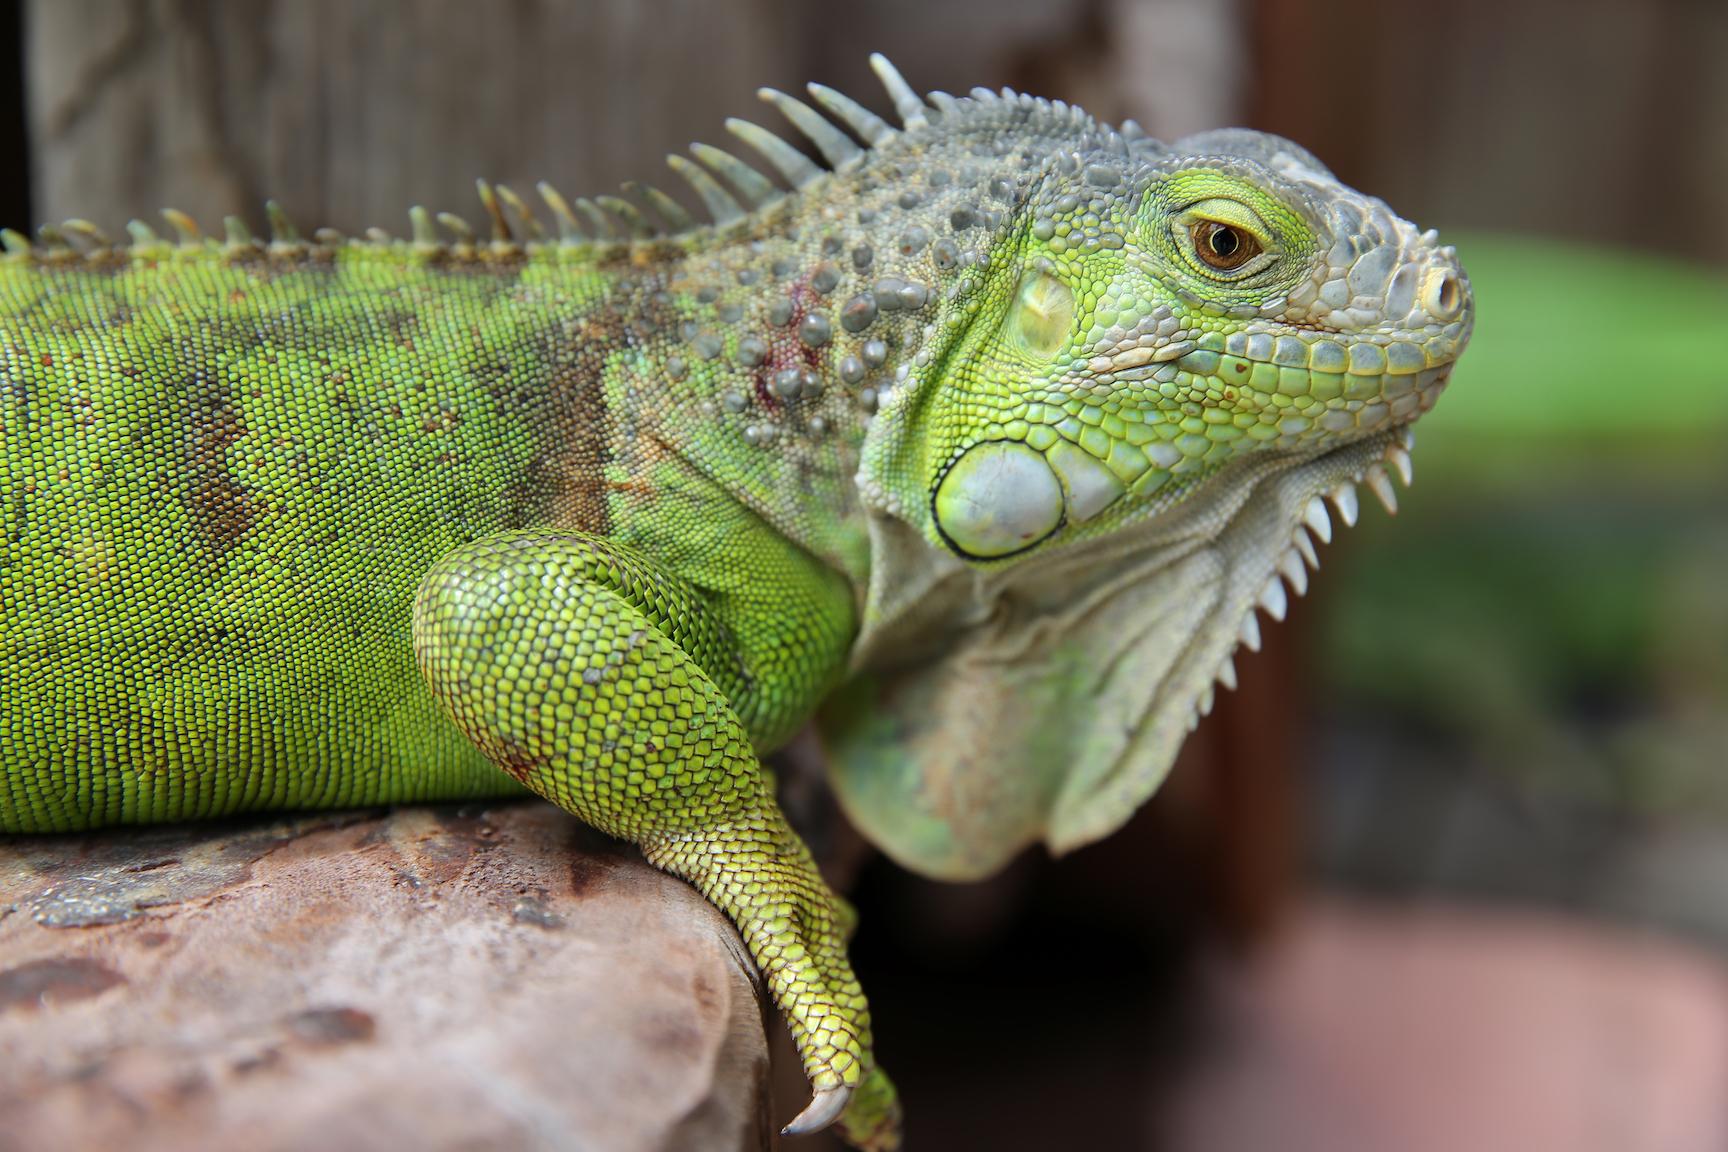 reptiles exotic amphibians pets earth concerns keeping keep